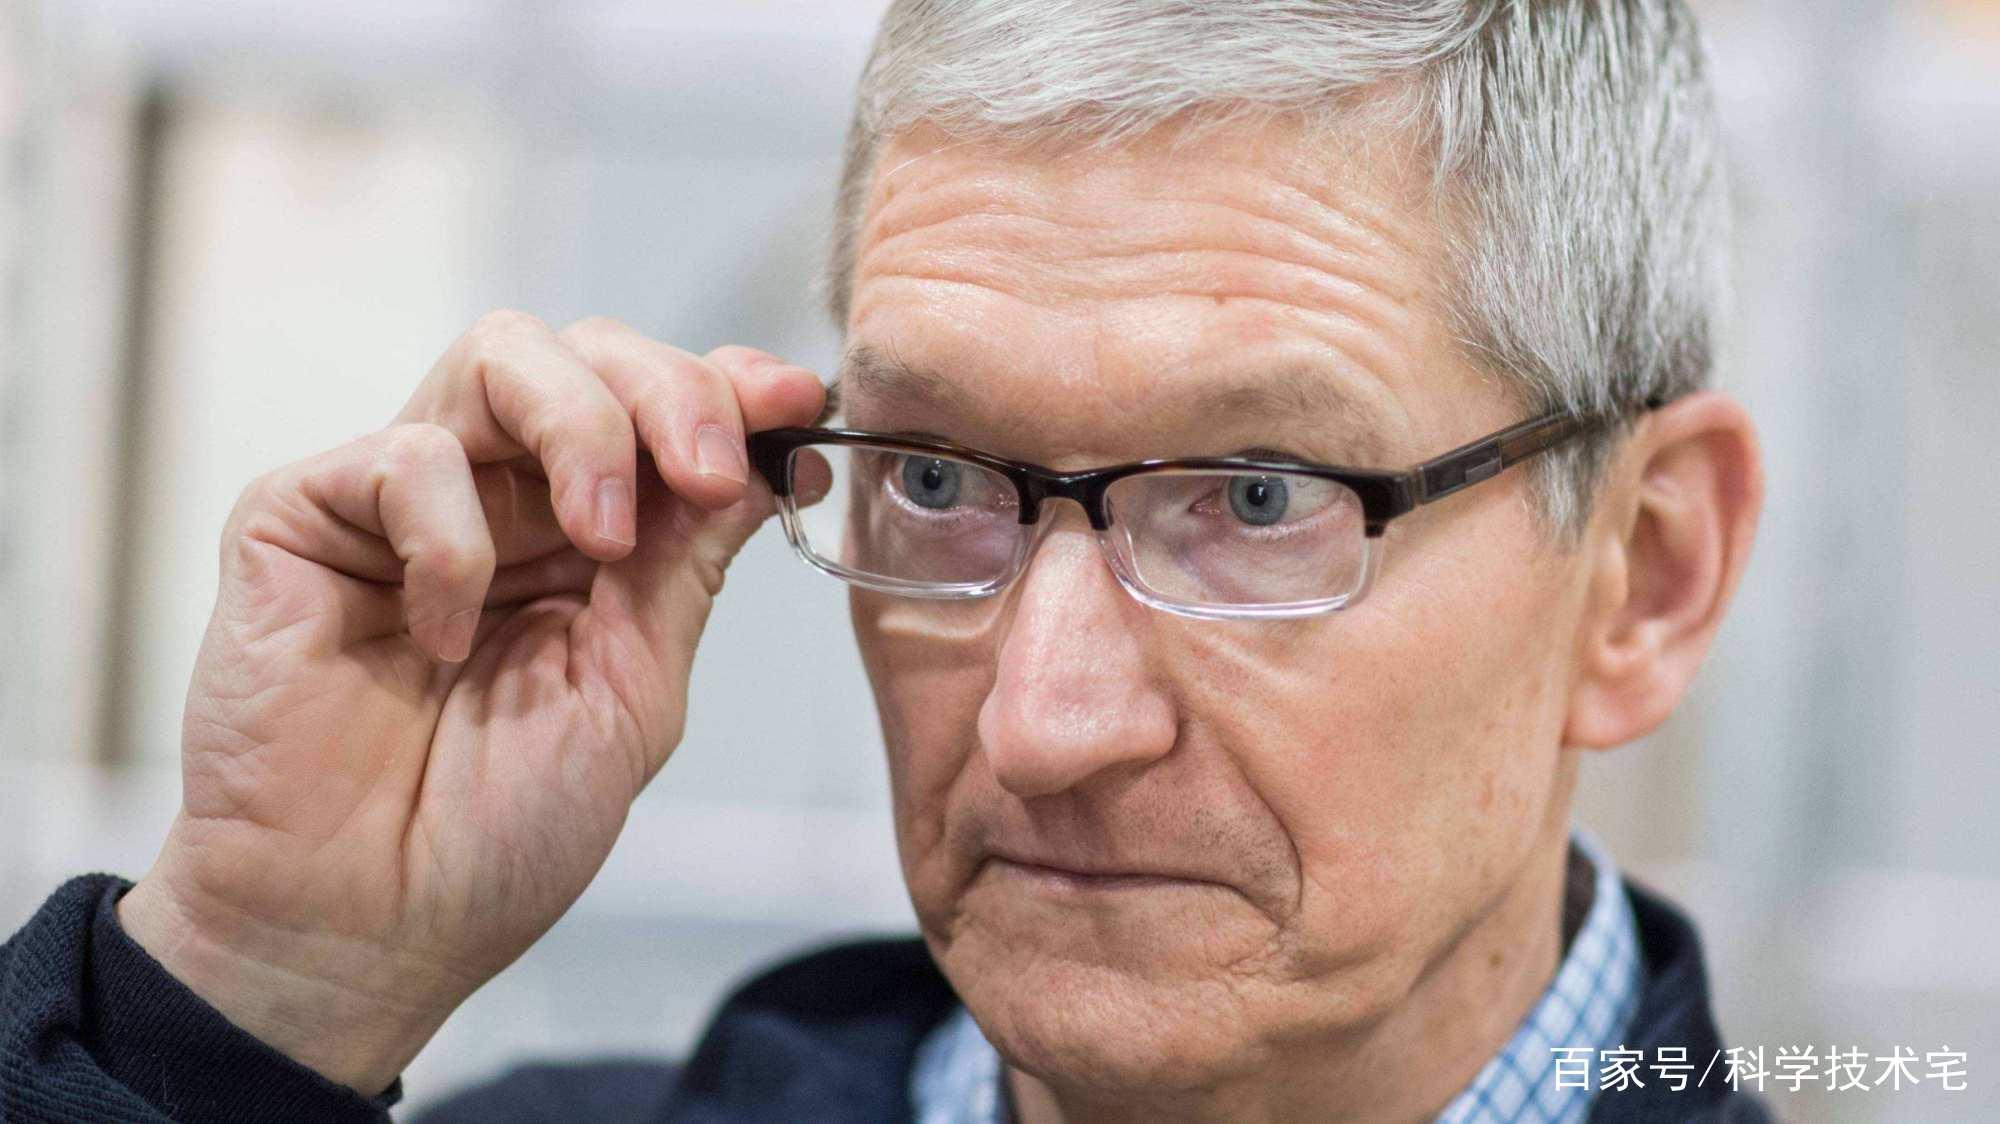 iPhone全球销量下滑,苹果营收为何继续增长?